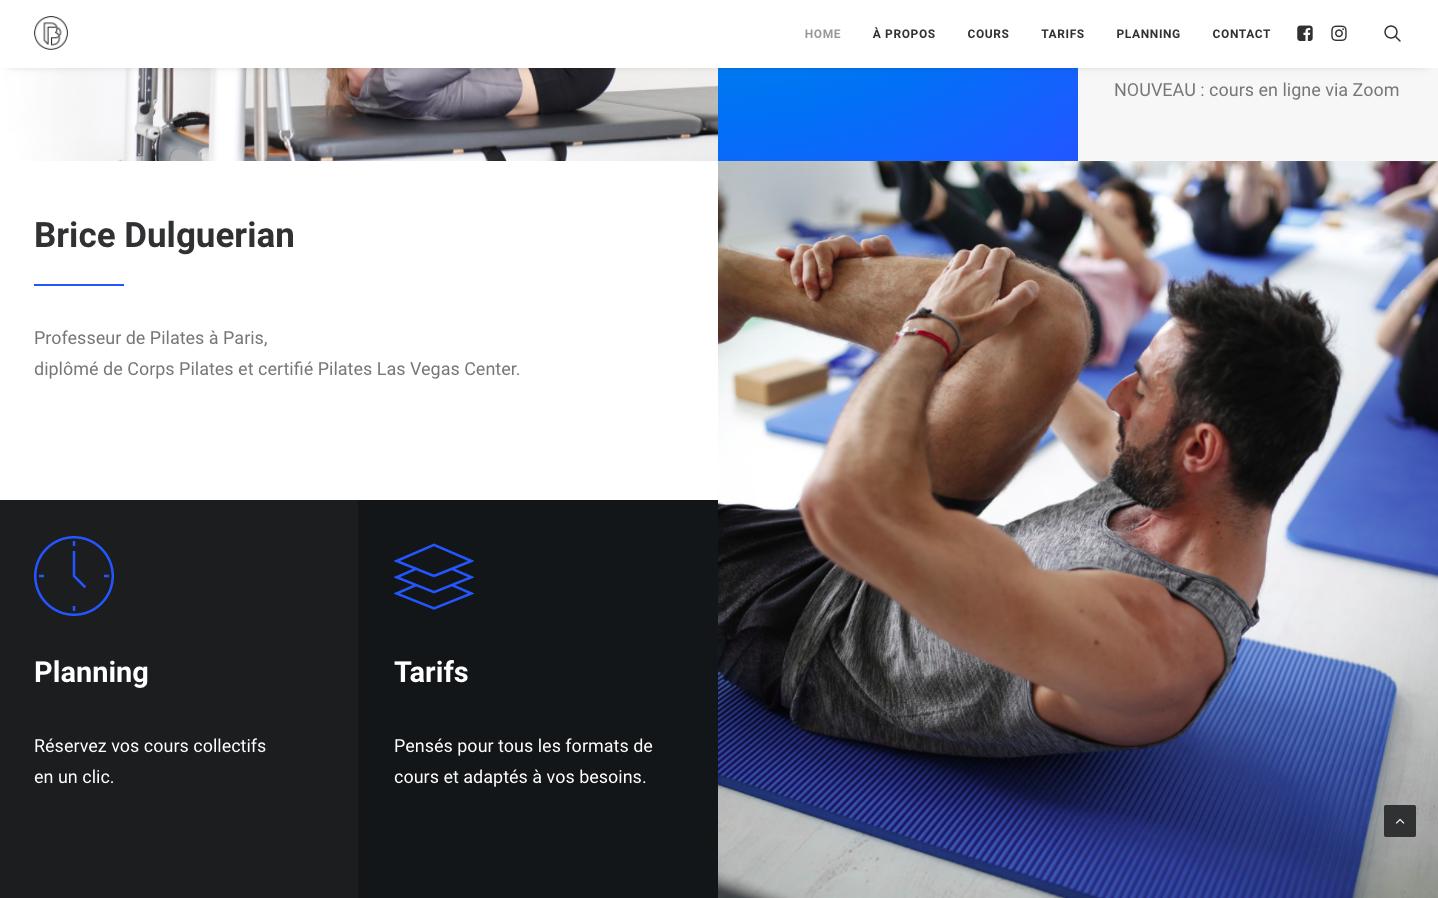 Création de site sur Wordpress - Brice Pilates - Brice Dulguerian - In blossom